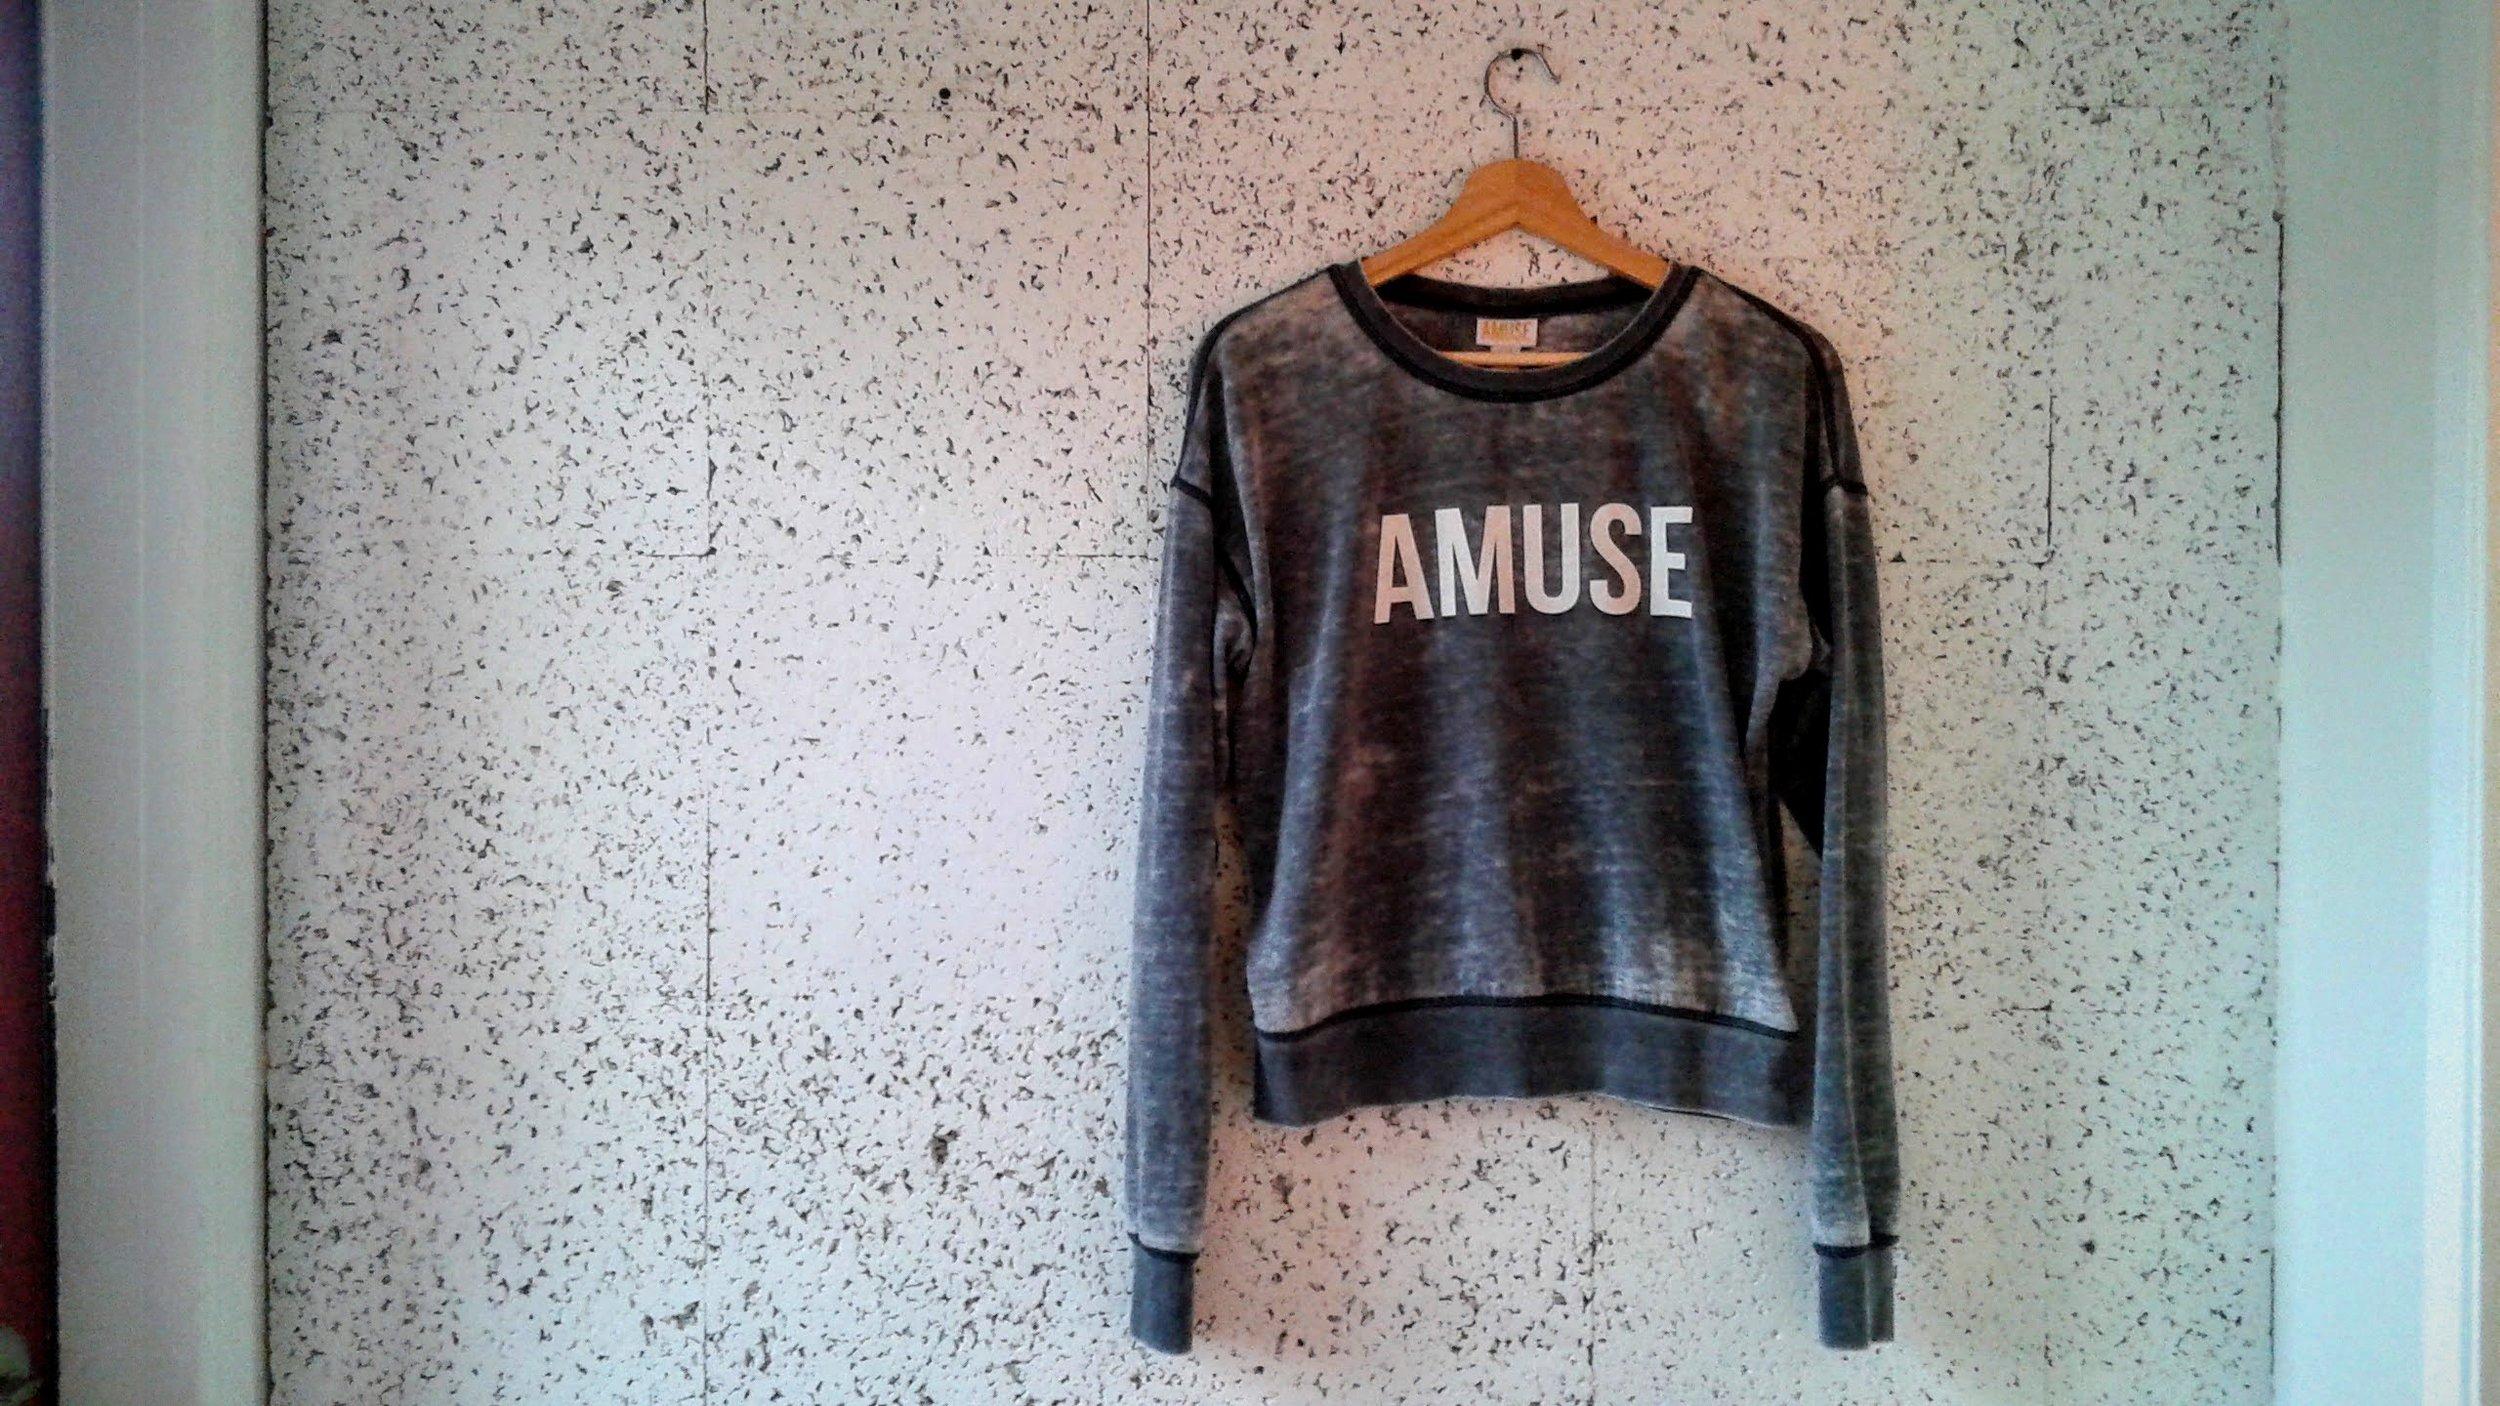 Amuse Society sweater; Size M, $18